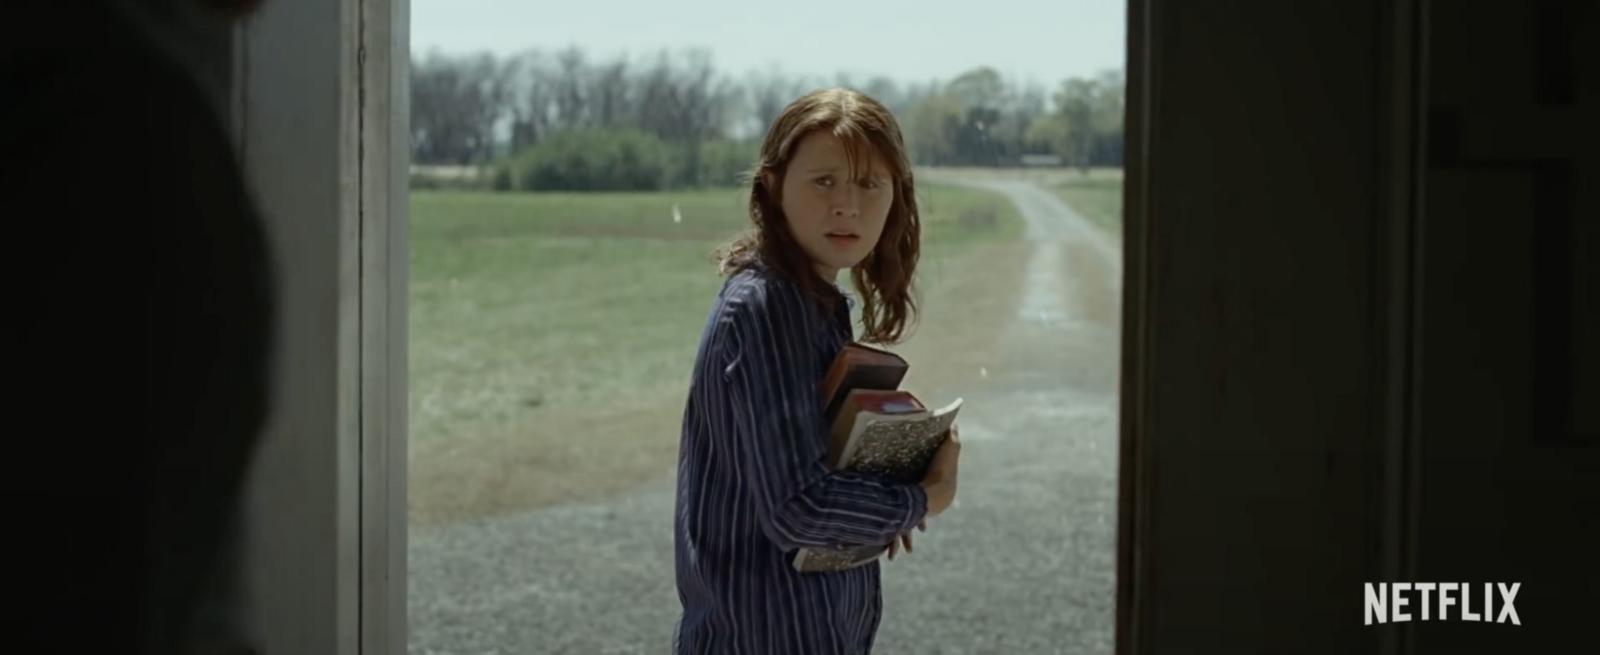 Eliza Scanlen in Netflix's The Devil All the Time